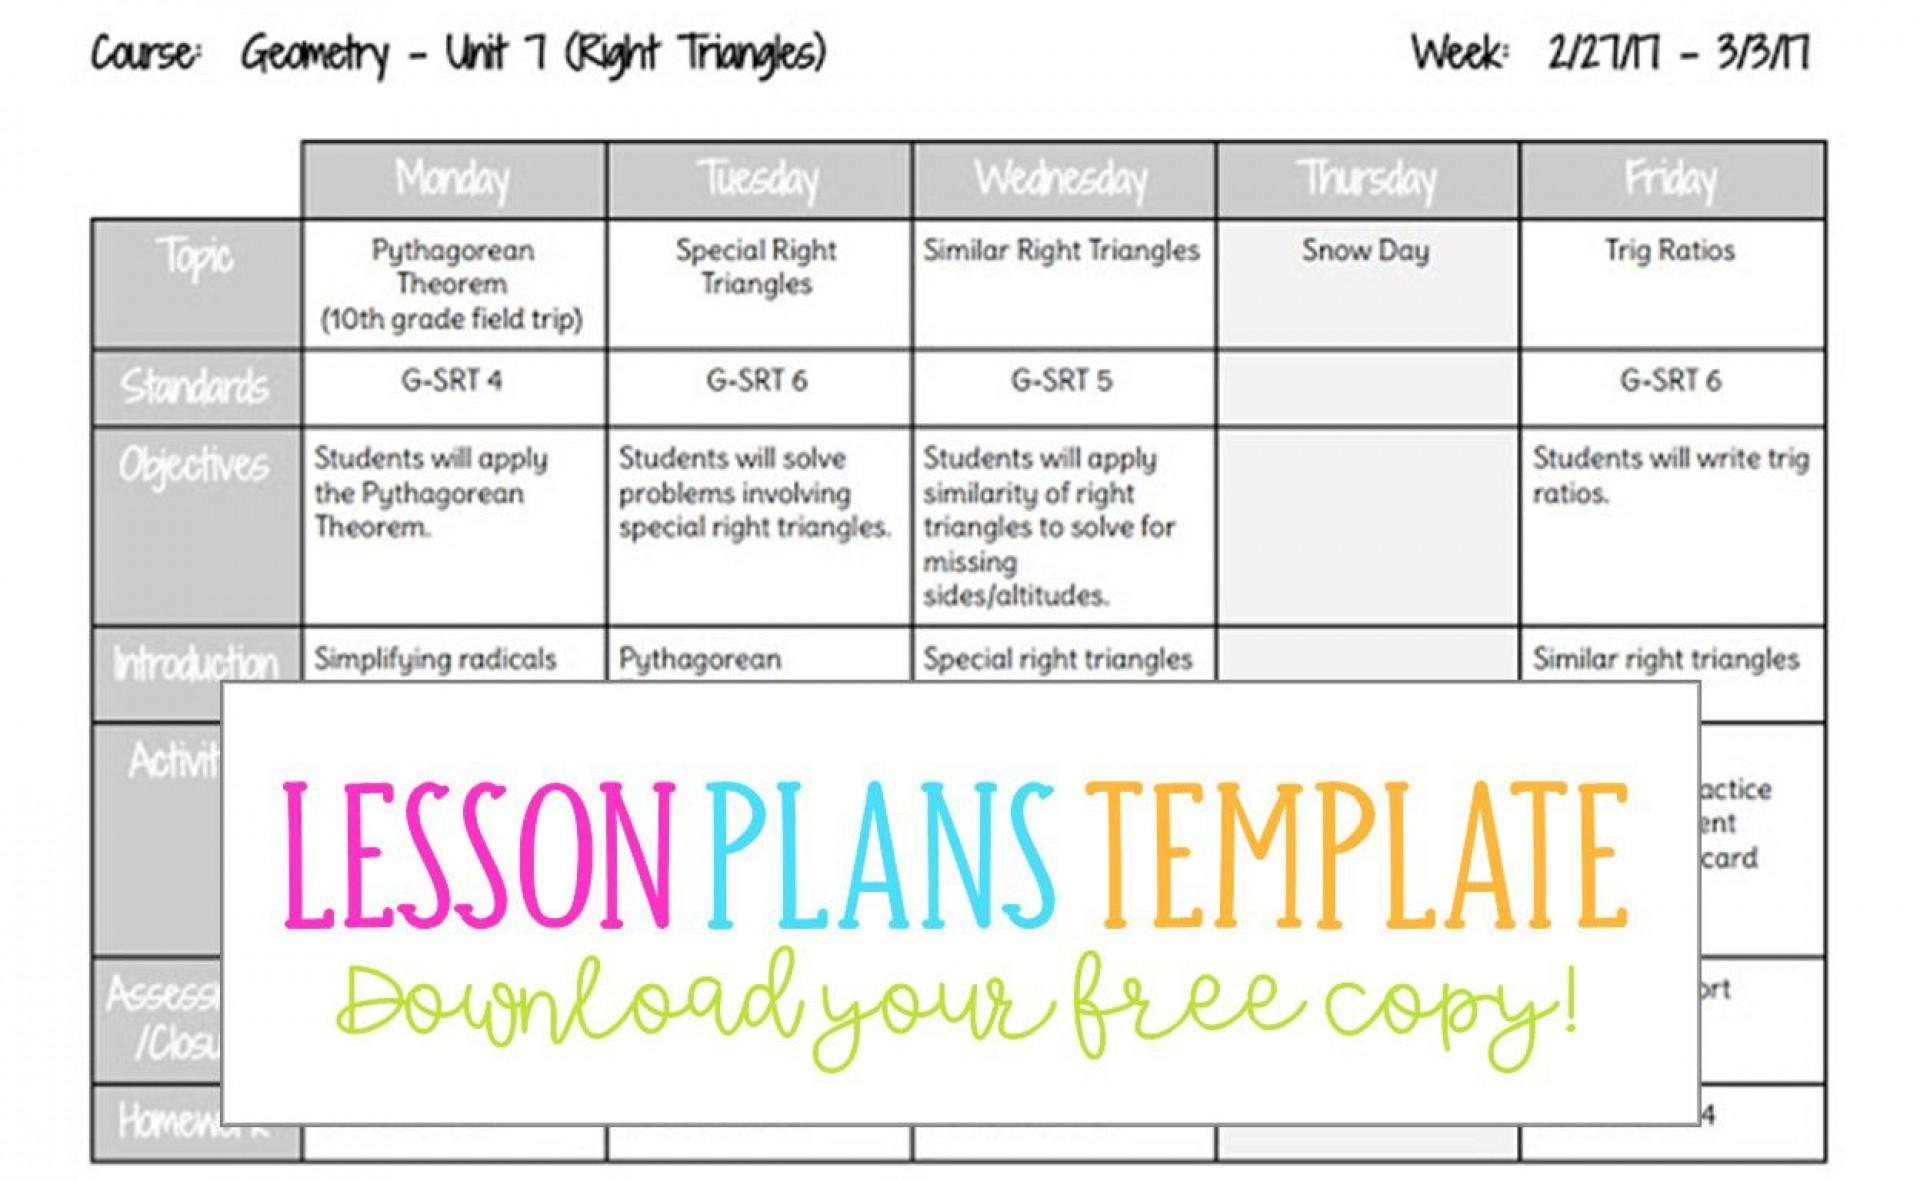 006 Singular Free Weekly Lesson Plan Template Google Doc Highest Clarity 1920